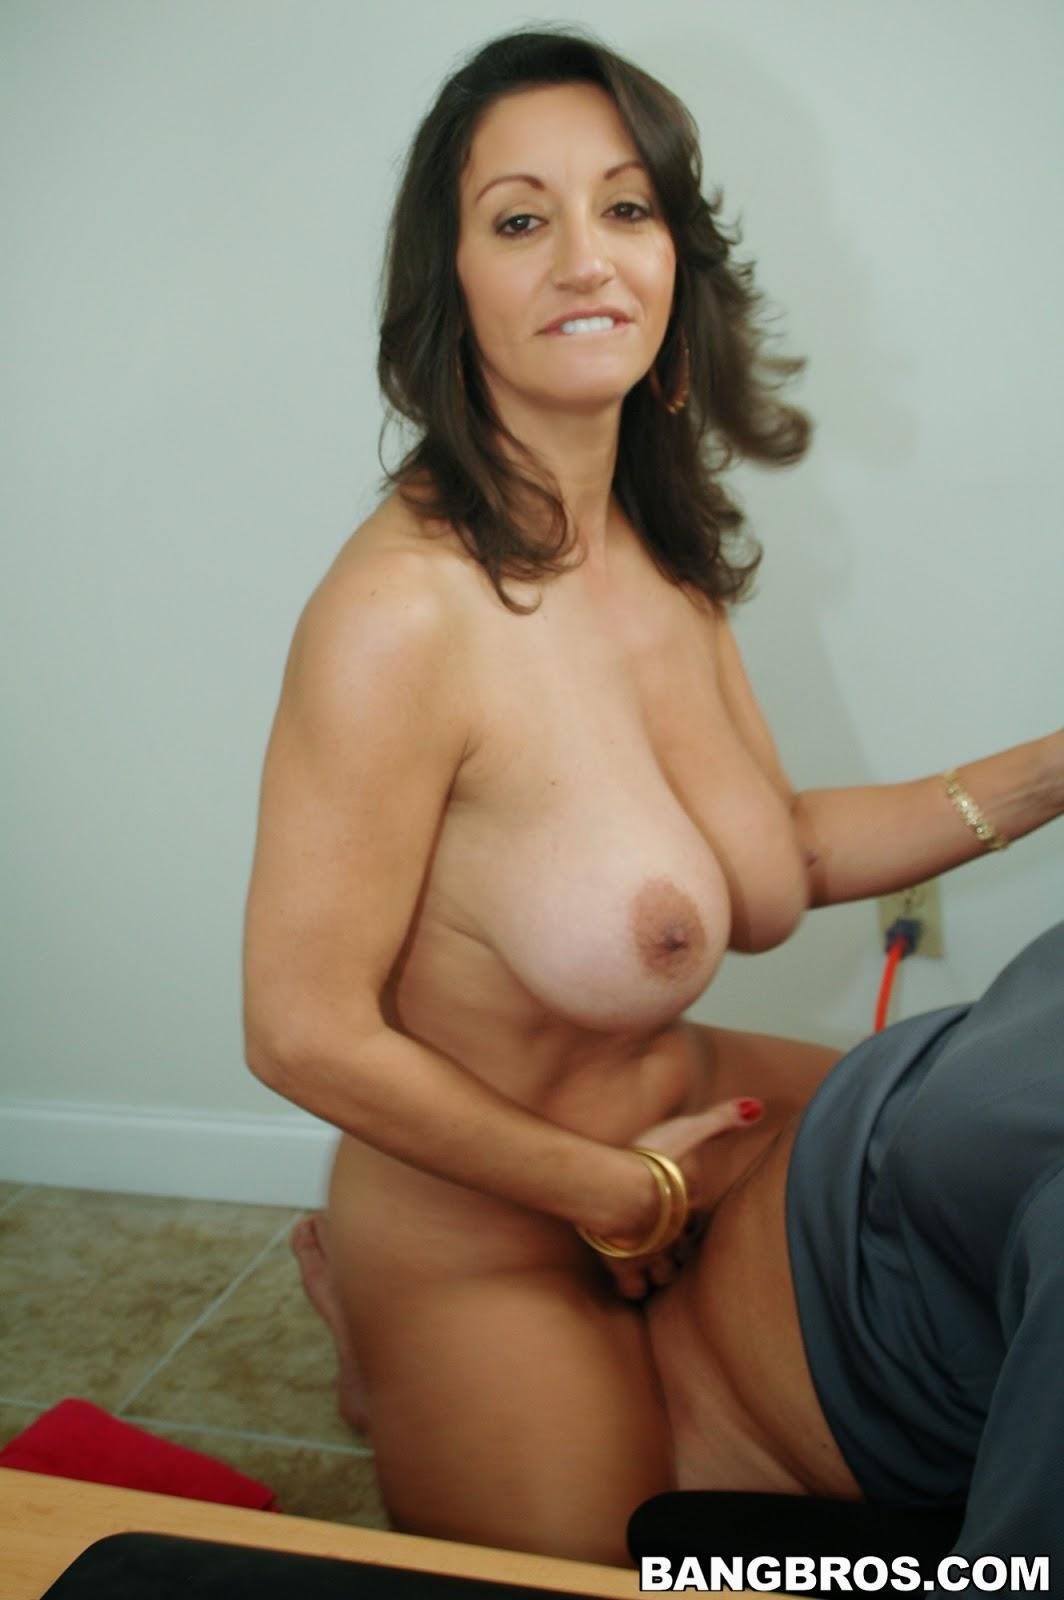 backroom milf persia - porn images